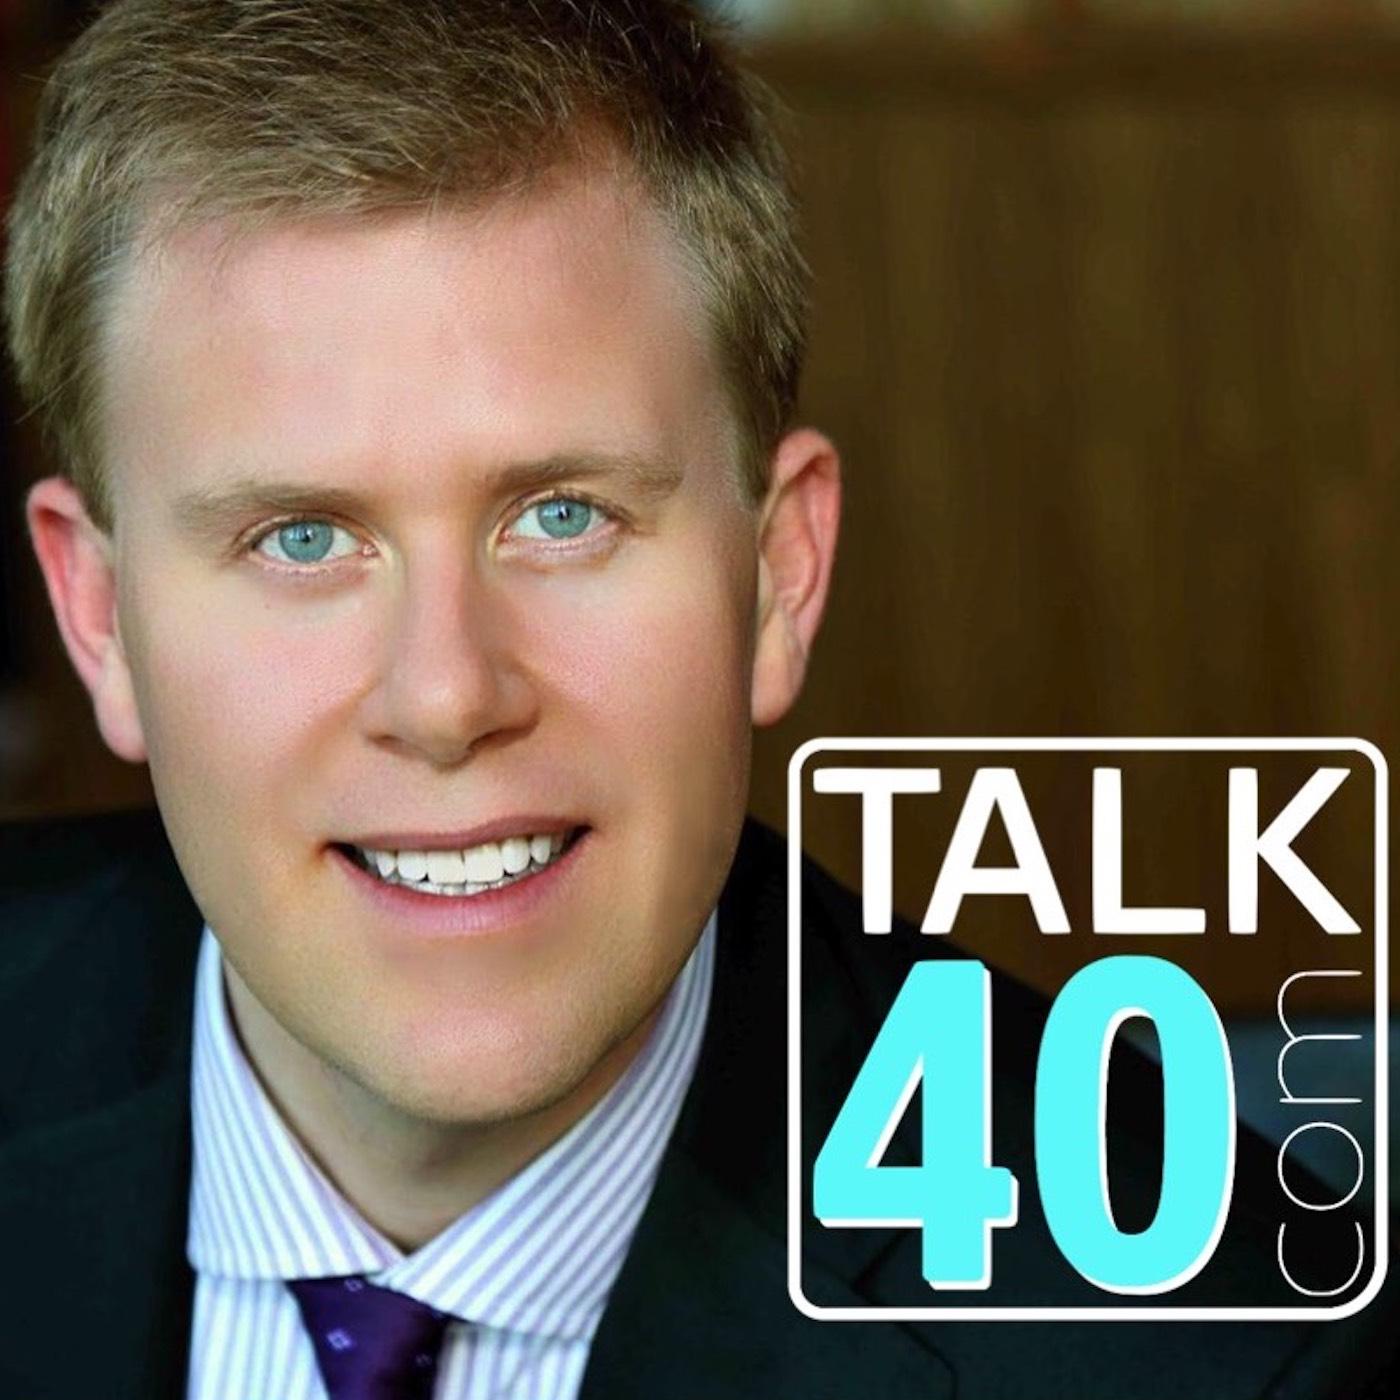 Talk40.com #MAGA News Politics Podcast - BRYAN CRABTREE. show art